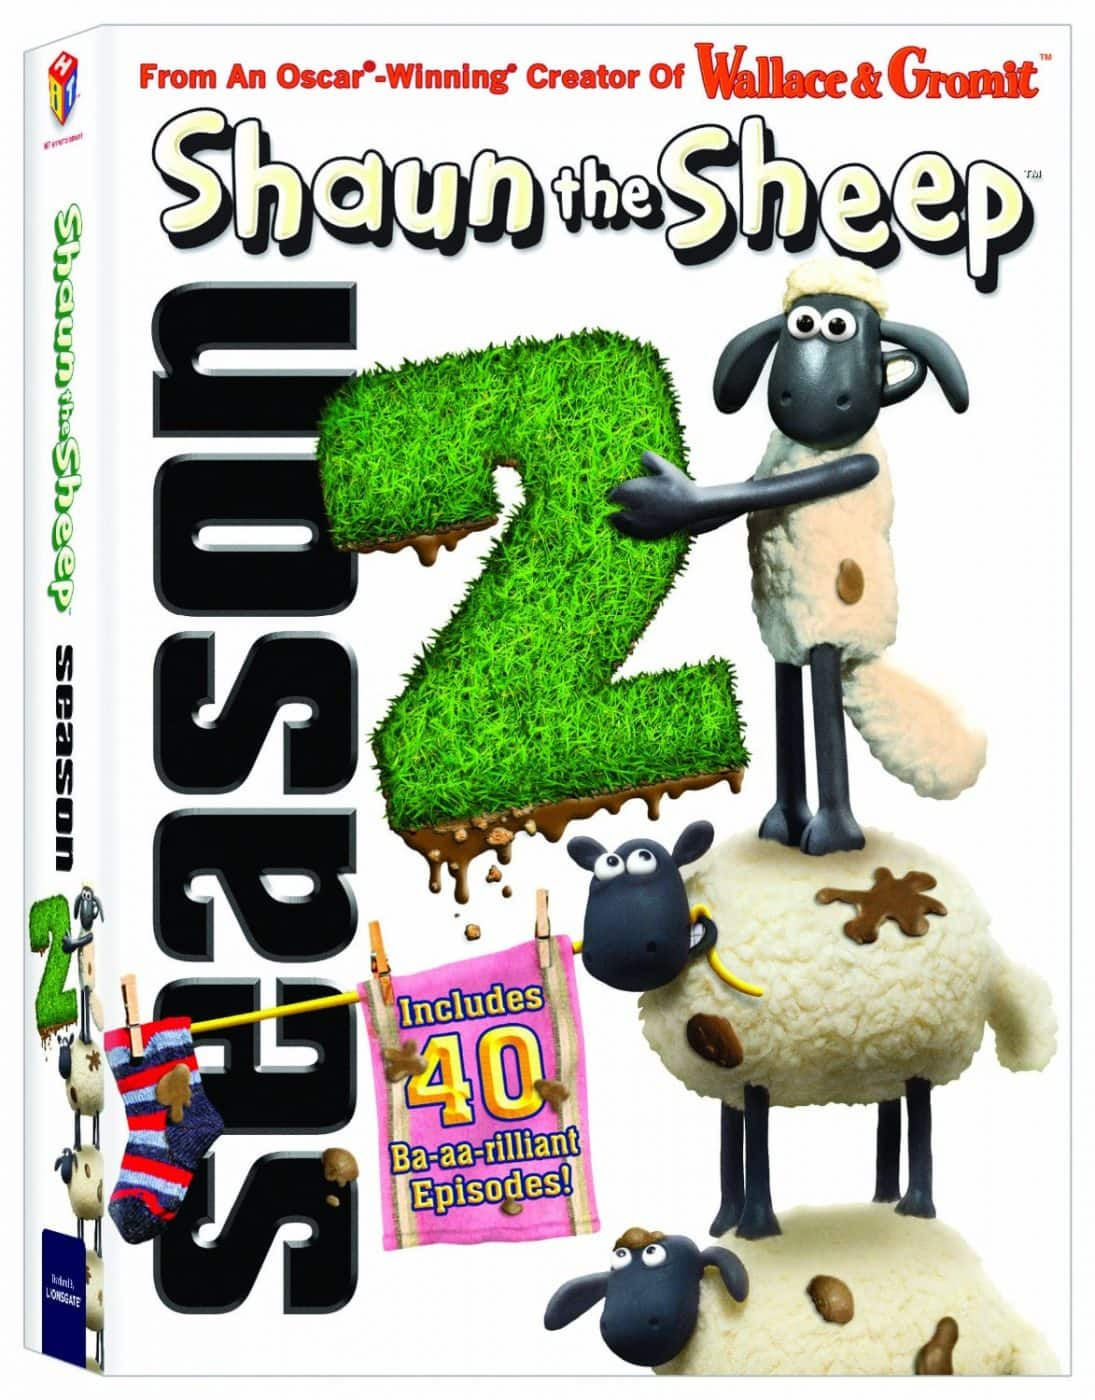 Shaun the Sheep: Season 2 Gift Set